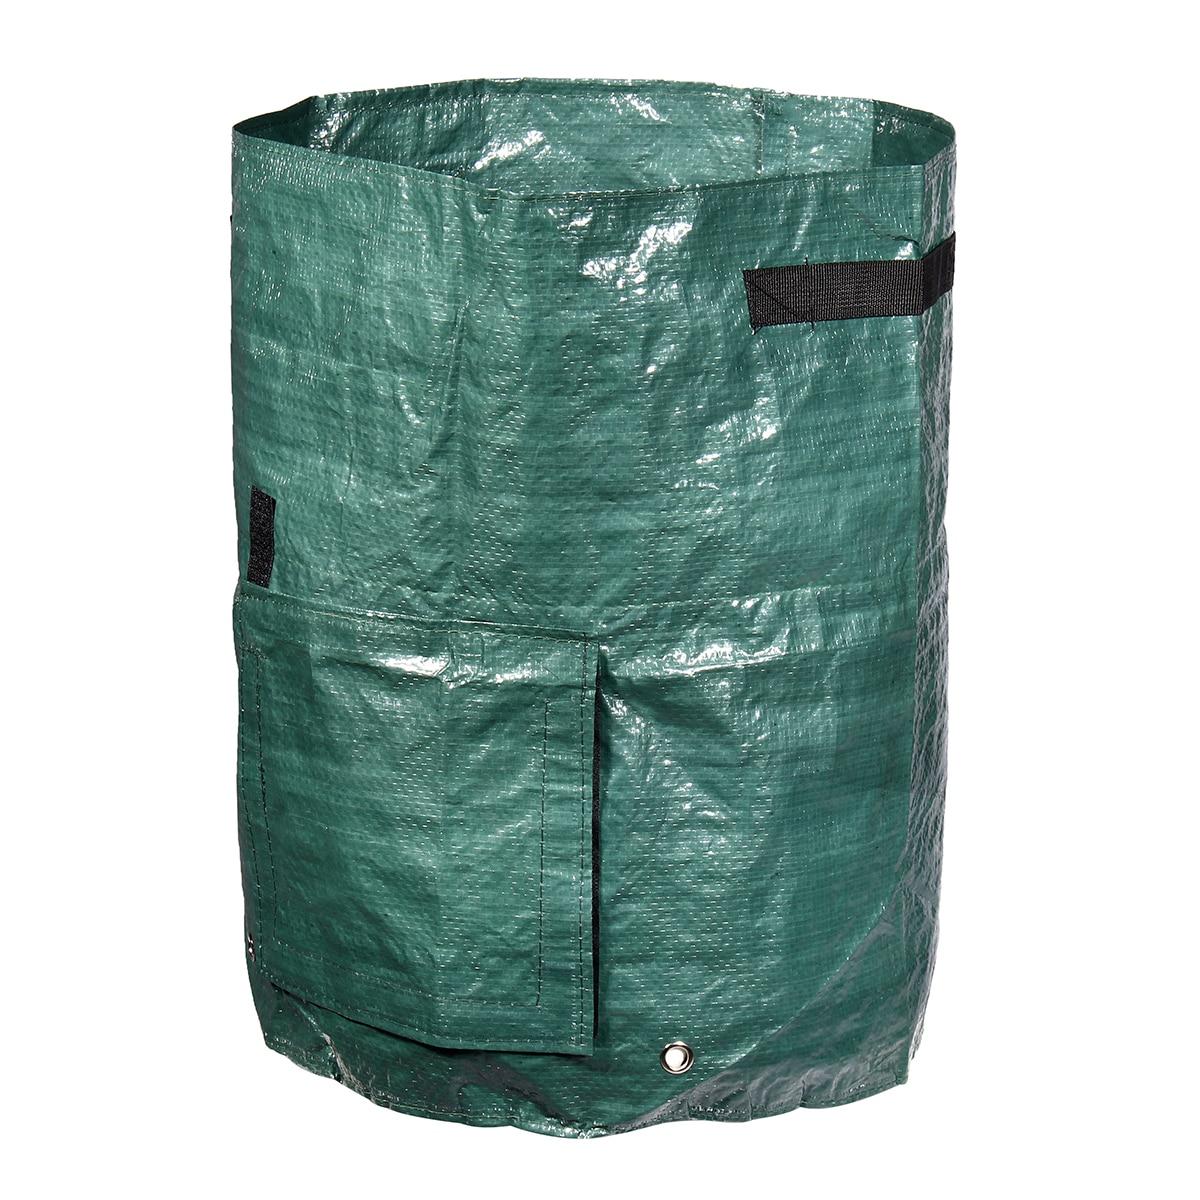 Garden Composter Bin Grow Bag 60L Eco Friendly Organic Compost ...